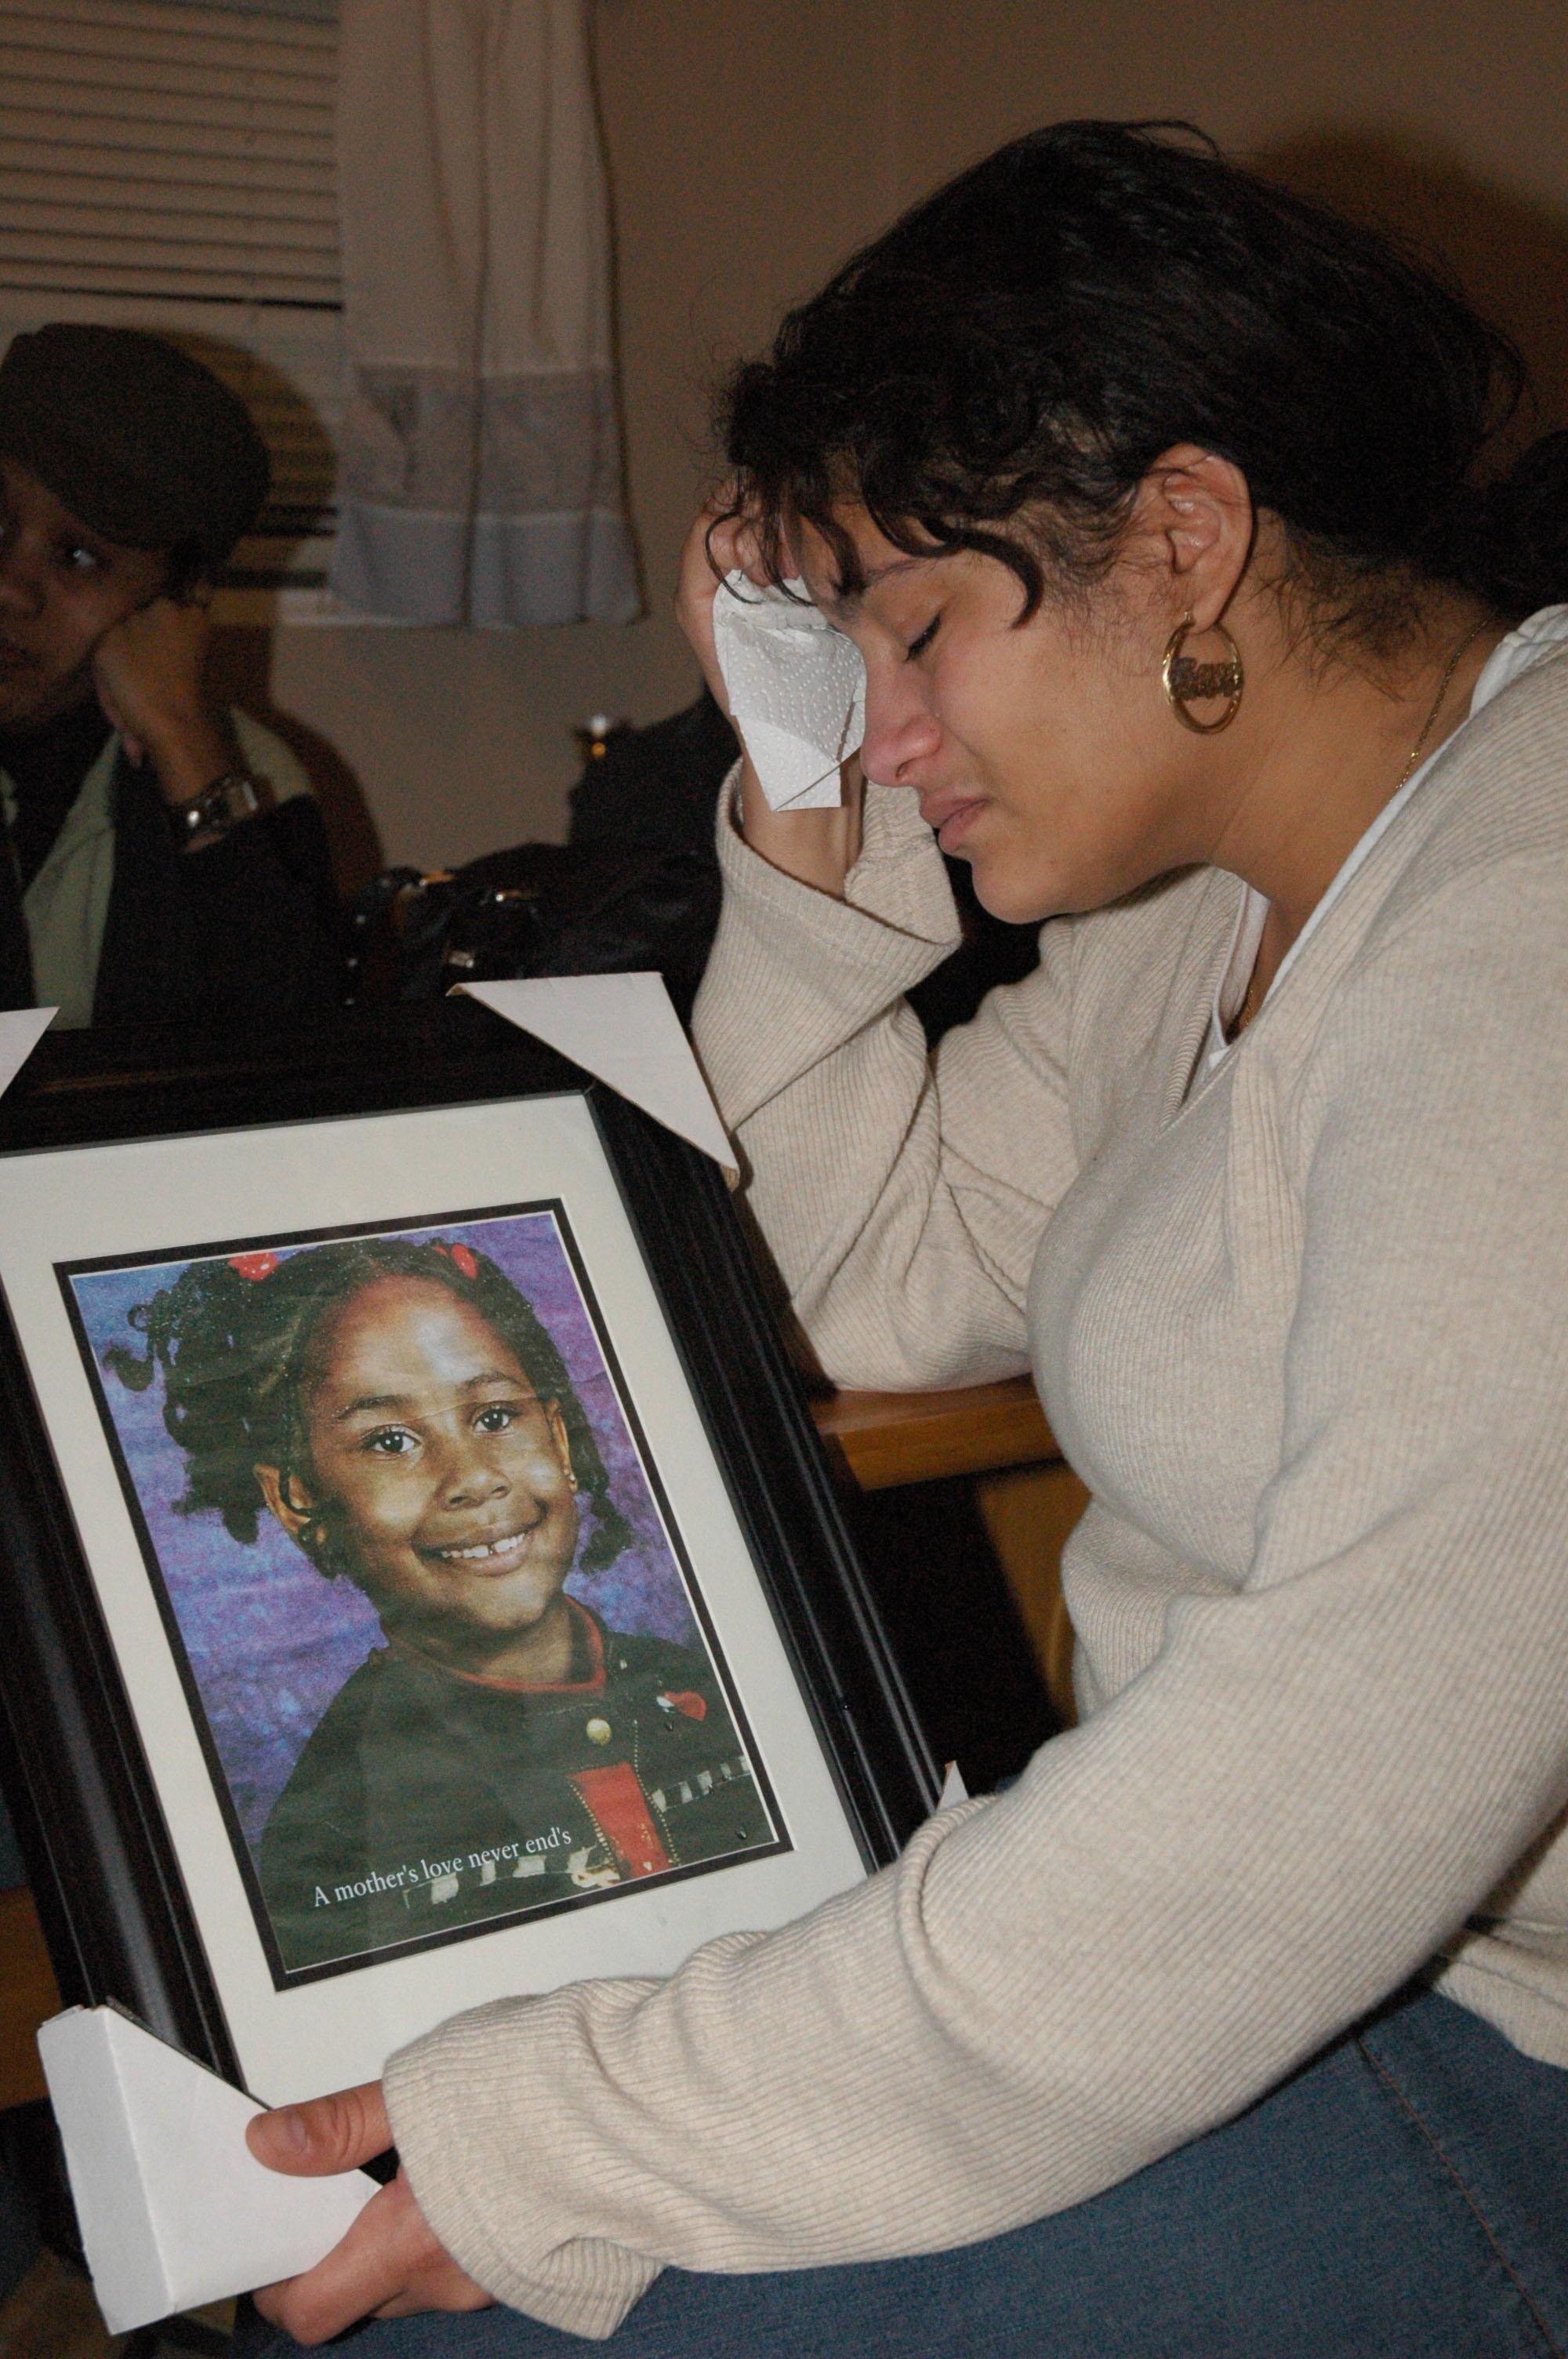 01.29.05 Newburgh, NY Lisa Mason holds a photo of her daughter.jpg